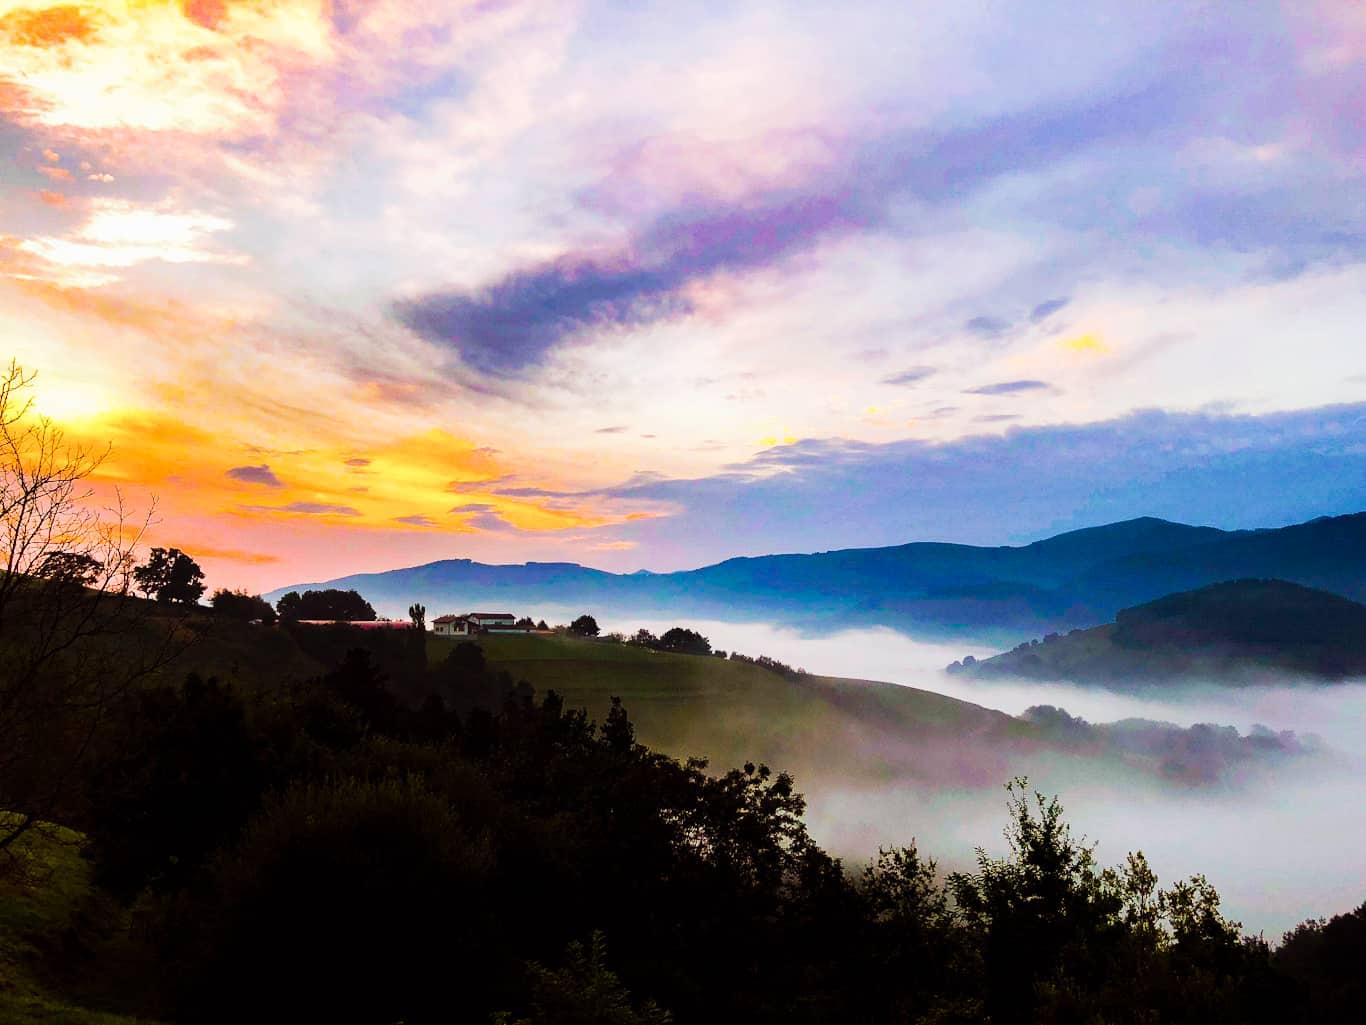 Baztan Valley at Dawn - pyreneanexperience.com